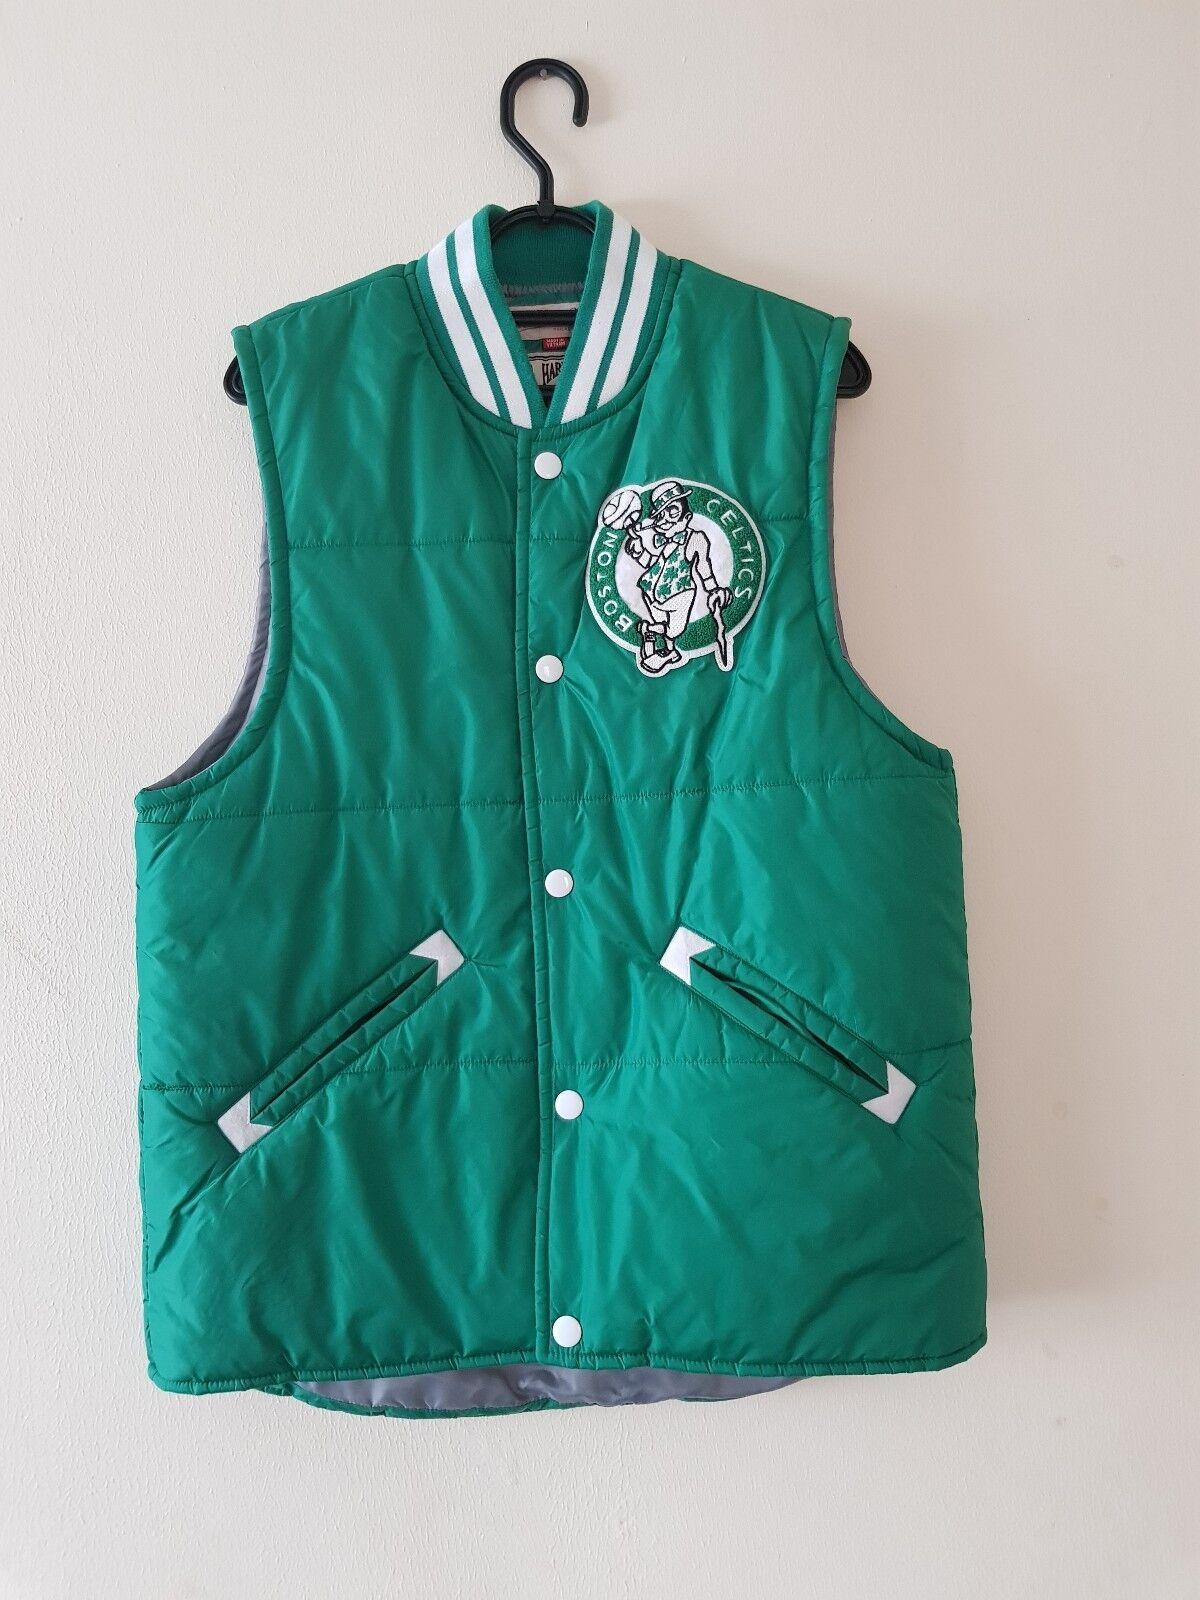 Mitchell and Ness Boston Celtics NBA Tailgate Vest Team colors size Medium